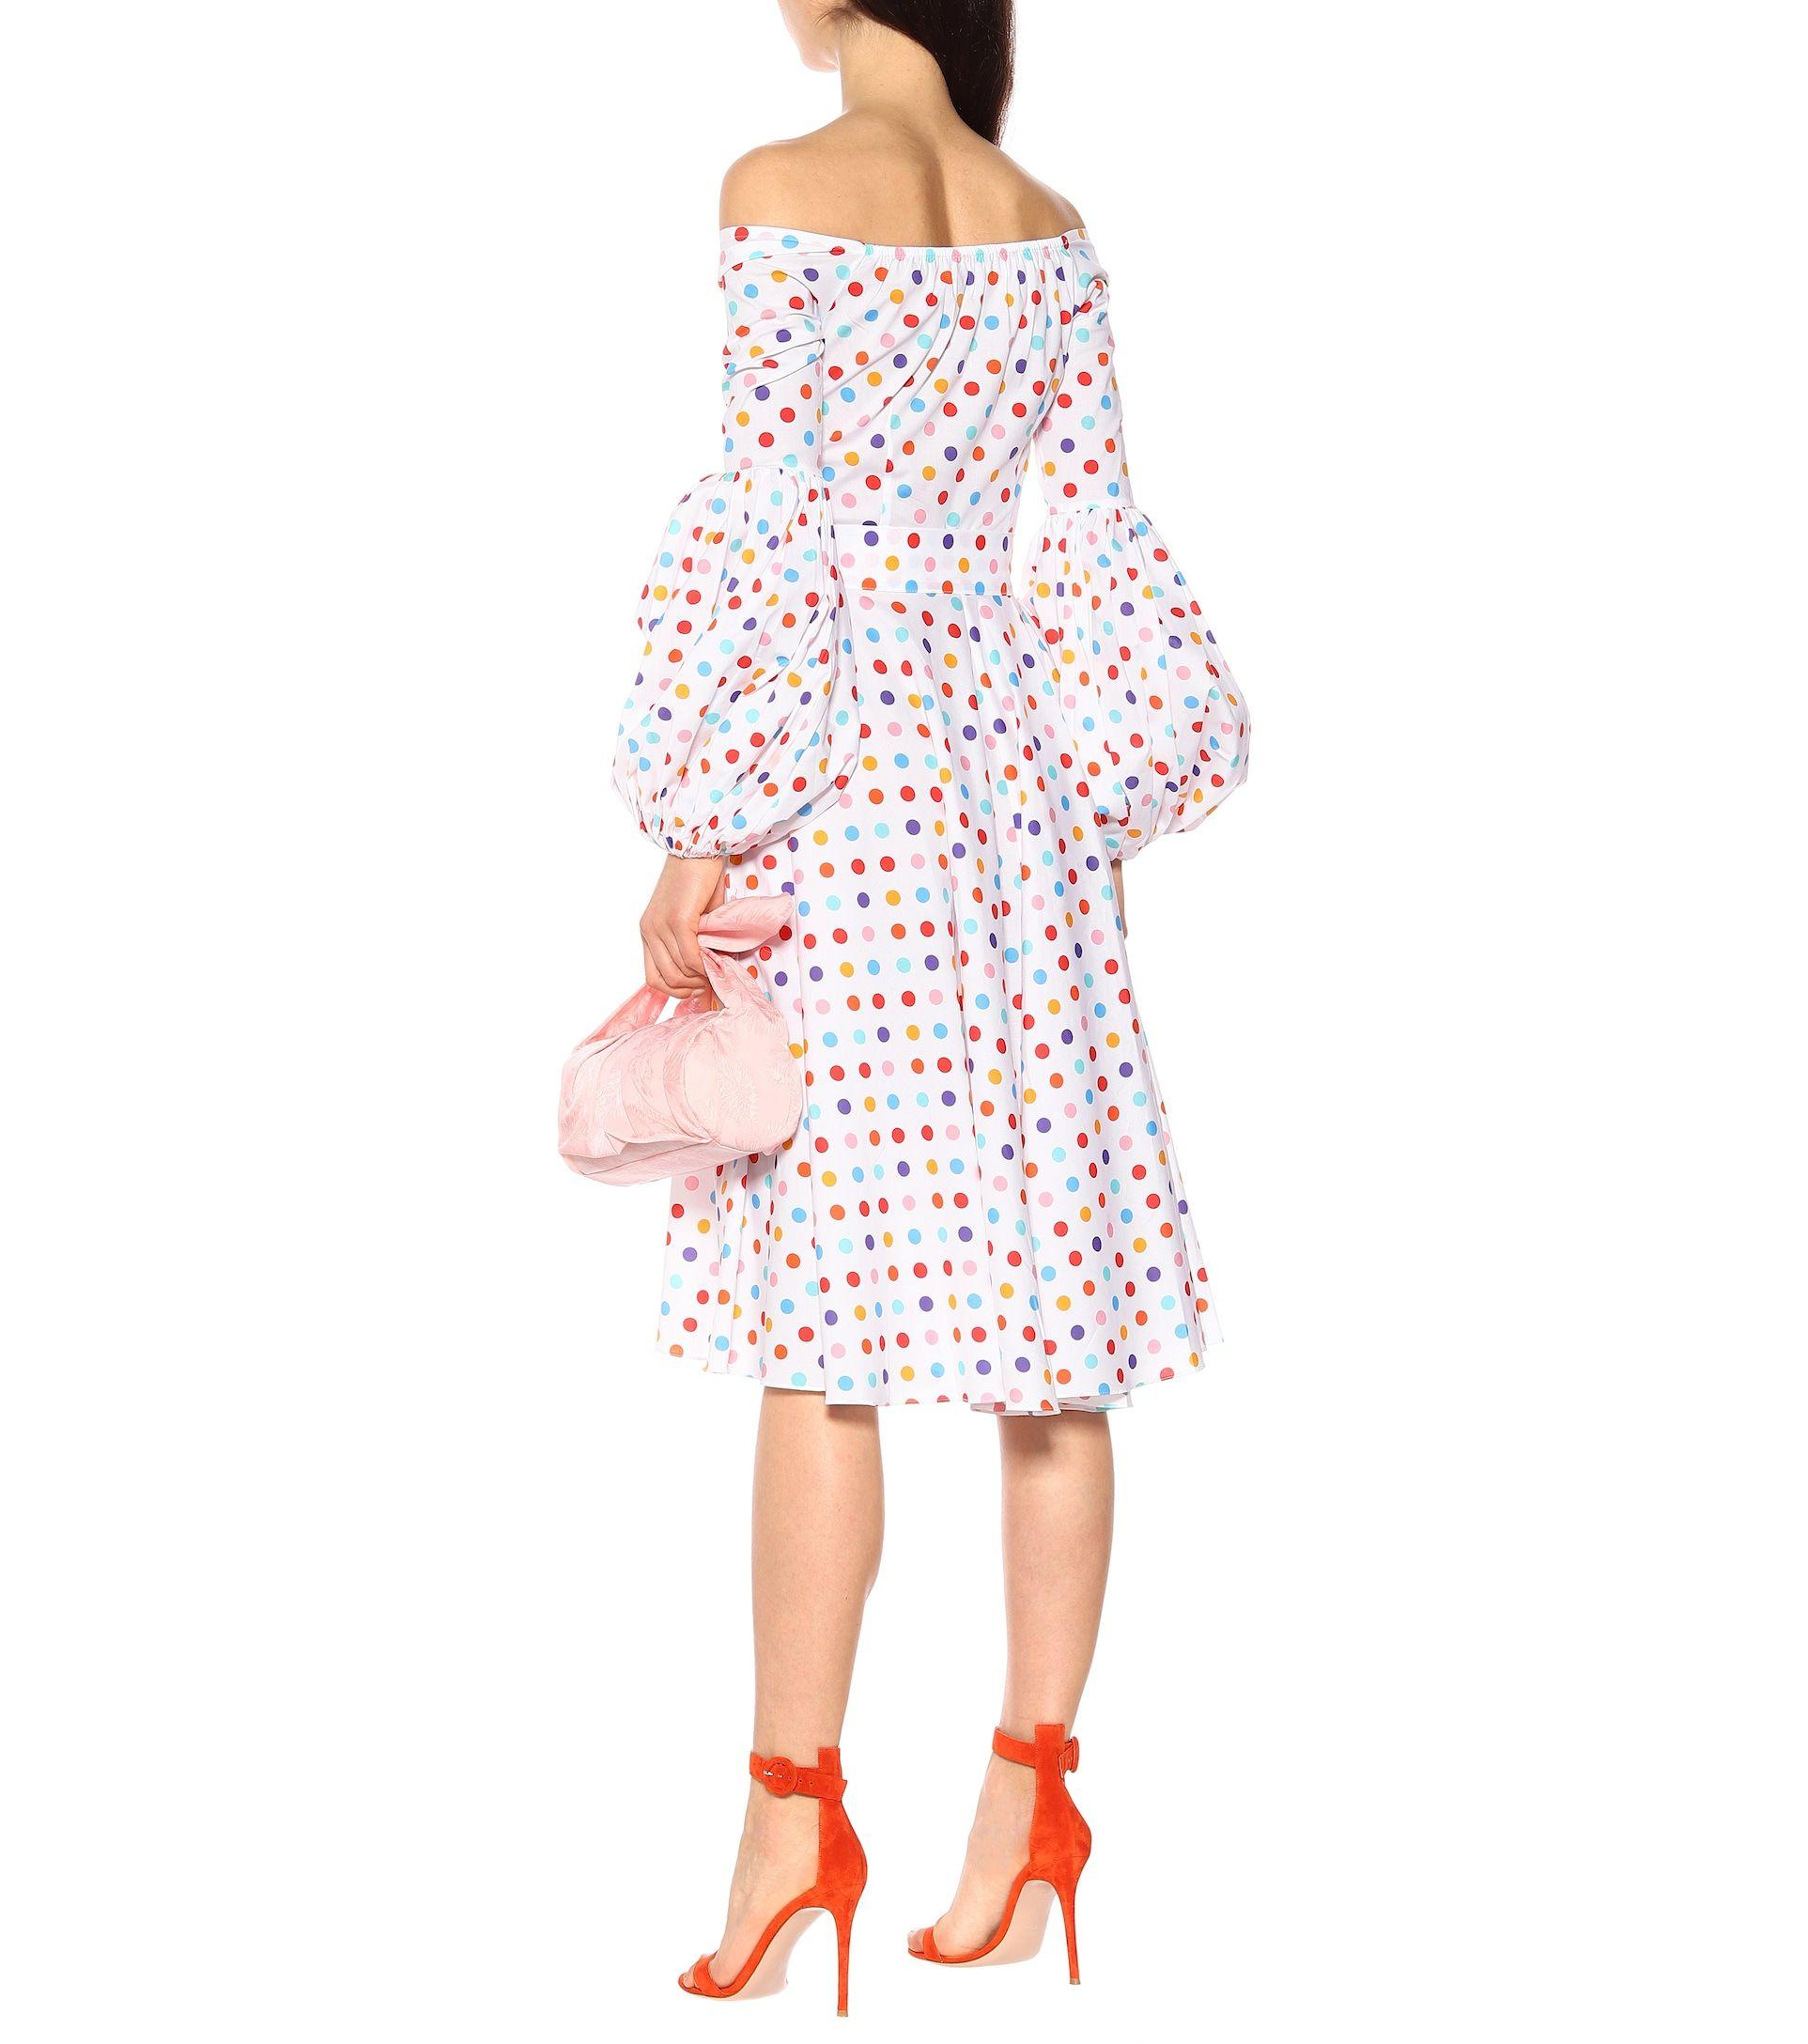 7d7c28a338e4 Caroline Constas Gisele polka-dot poplin dress in 2019 | dress2 ...